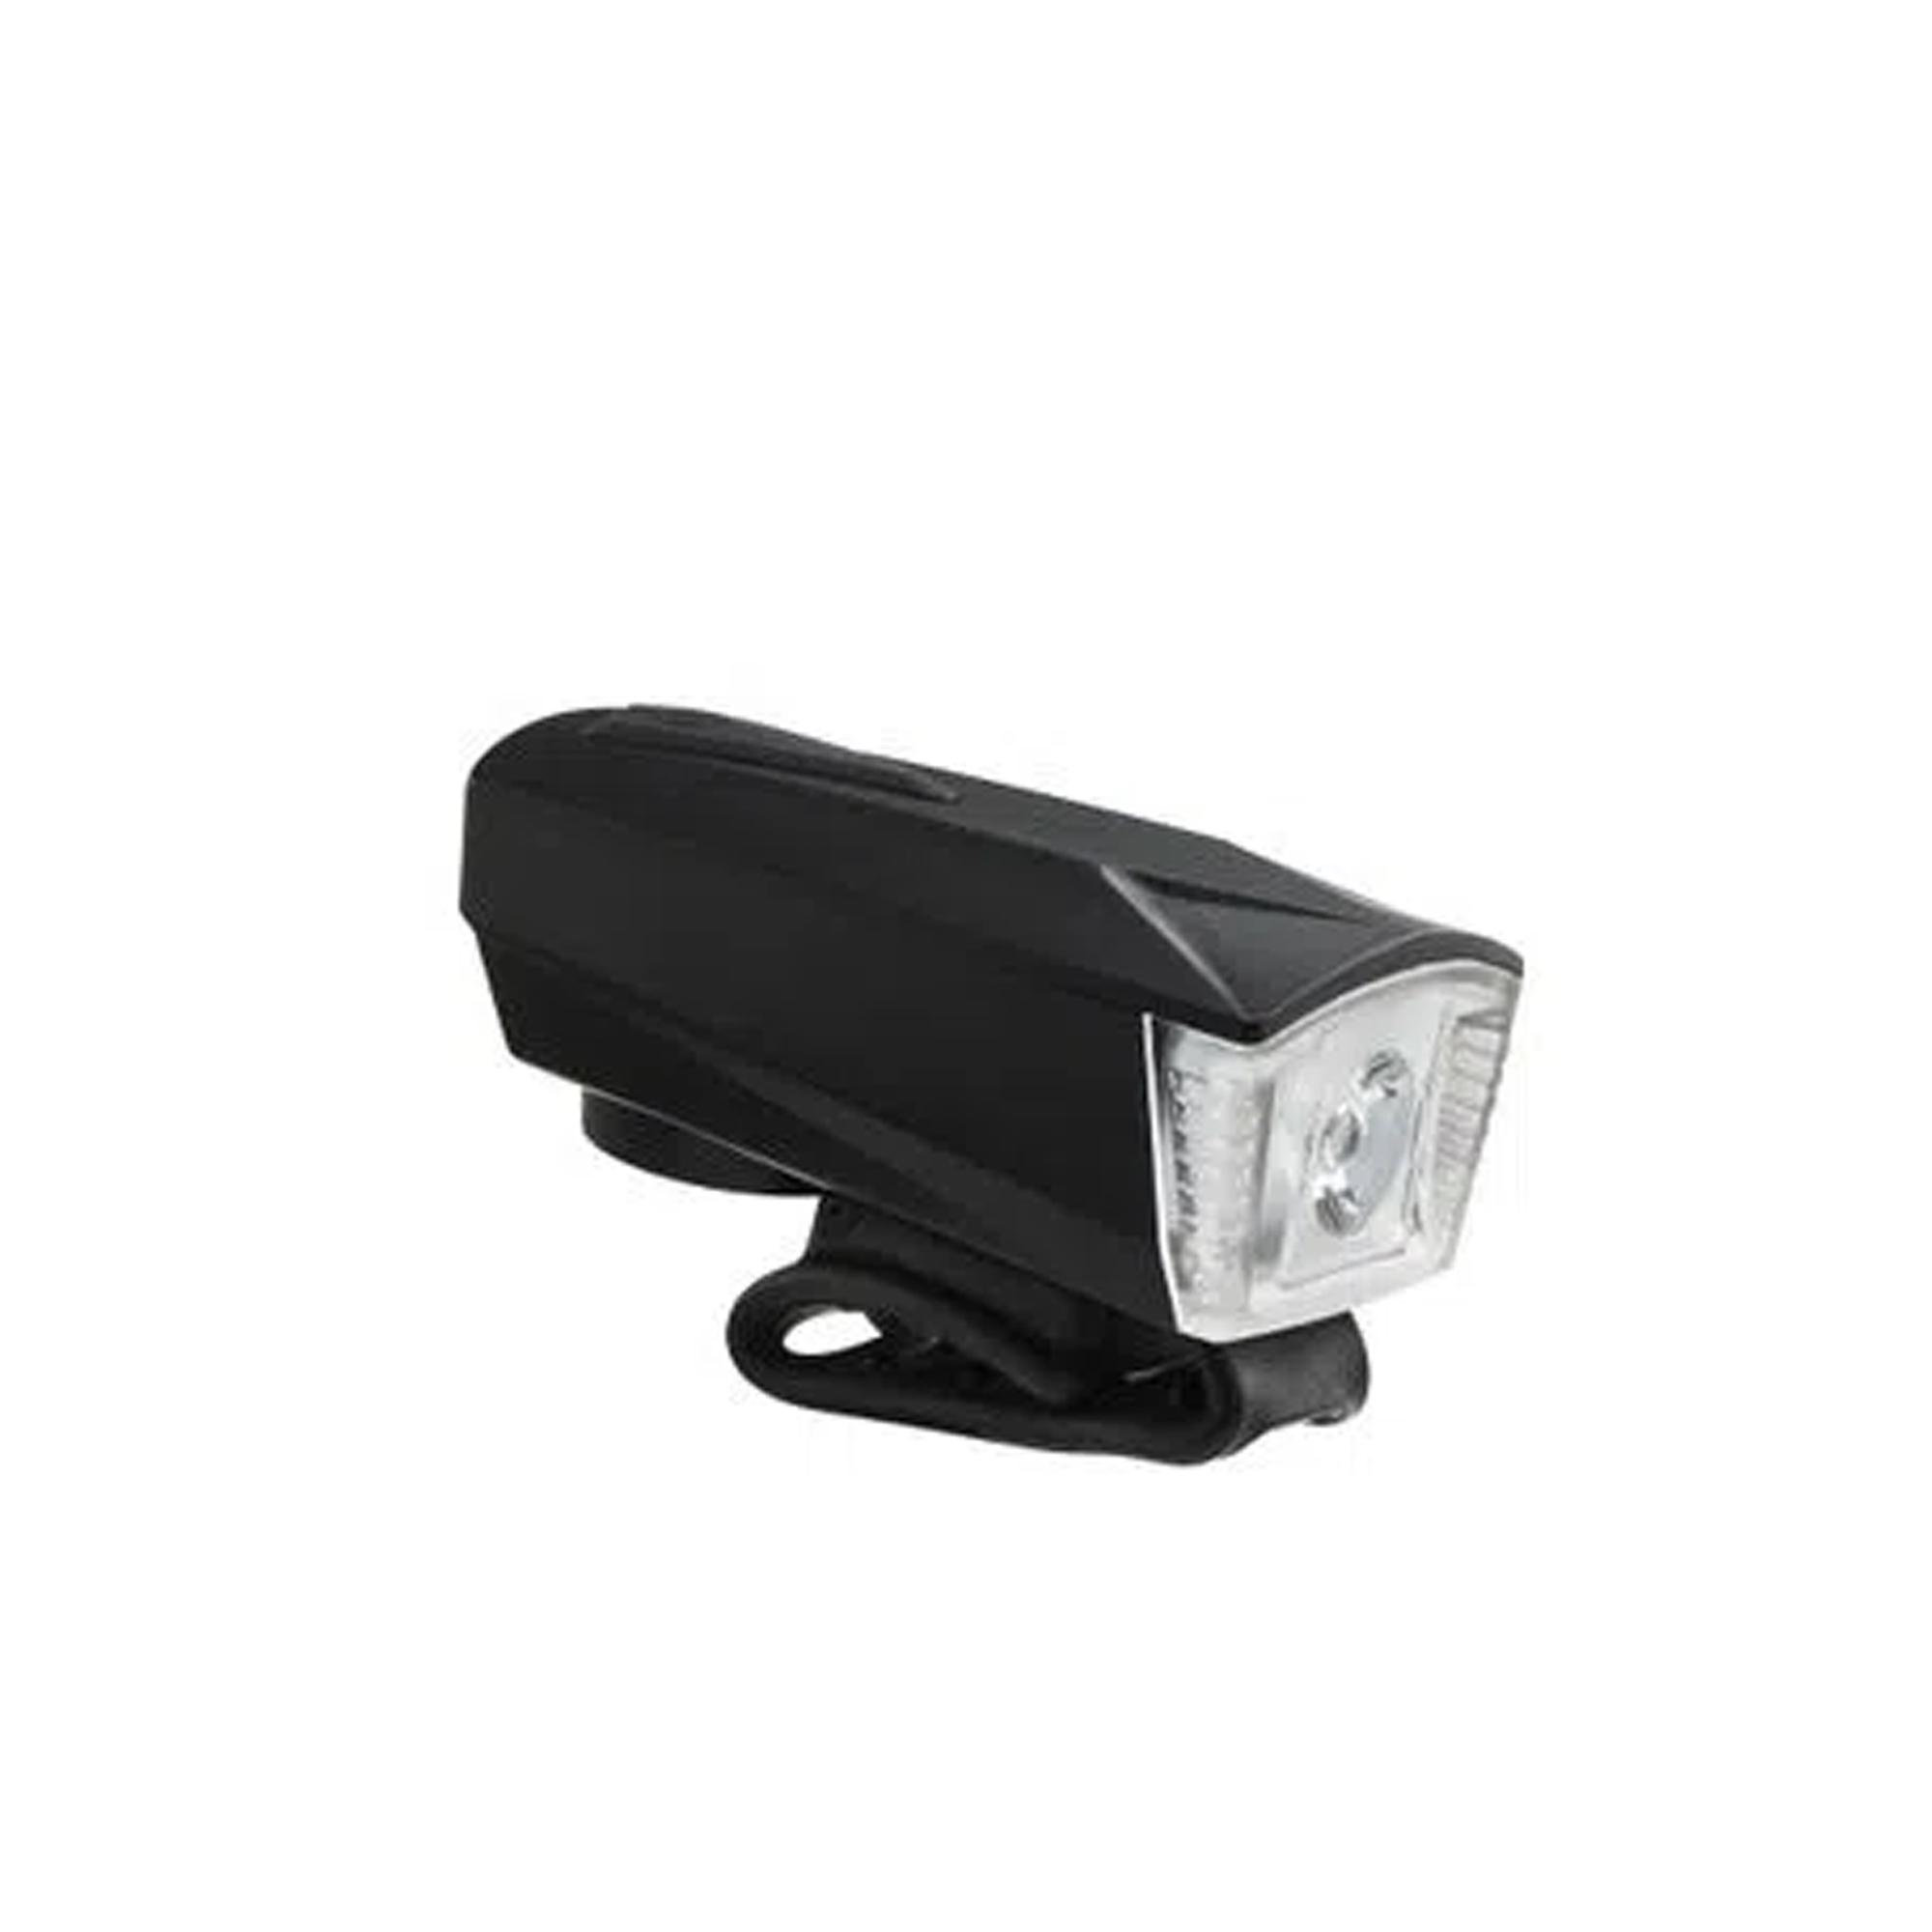 FAROL LED RECARREGÁVEL 190L 1200 MAH - ATRIO